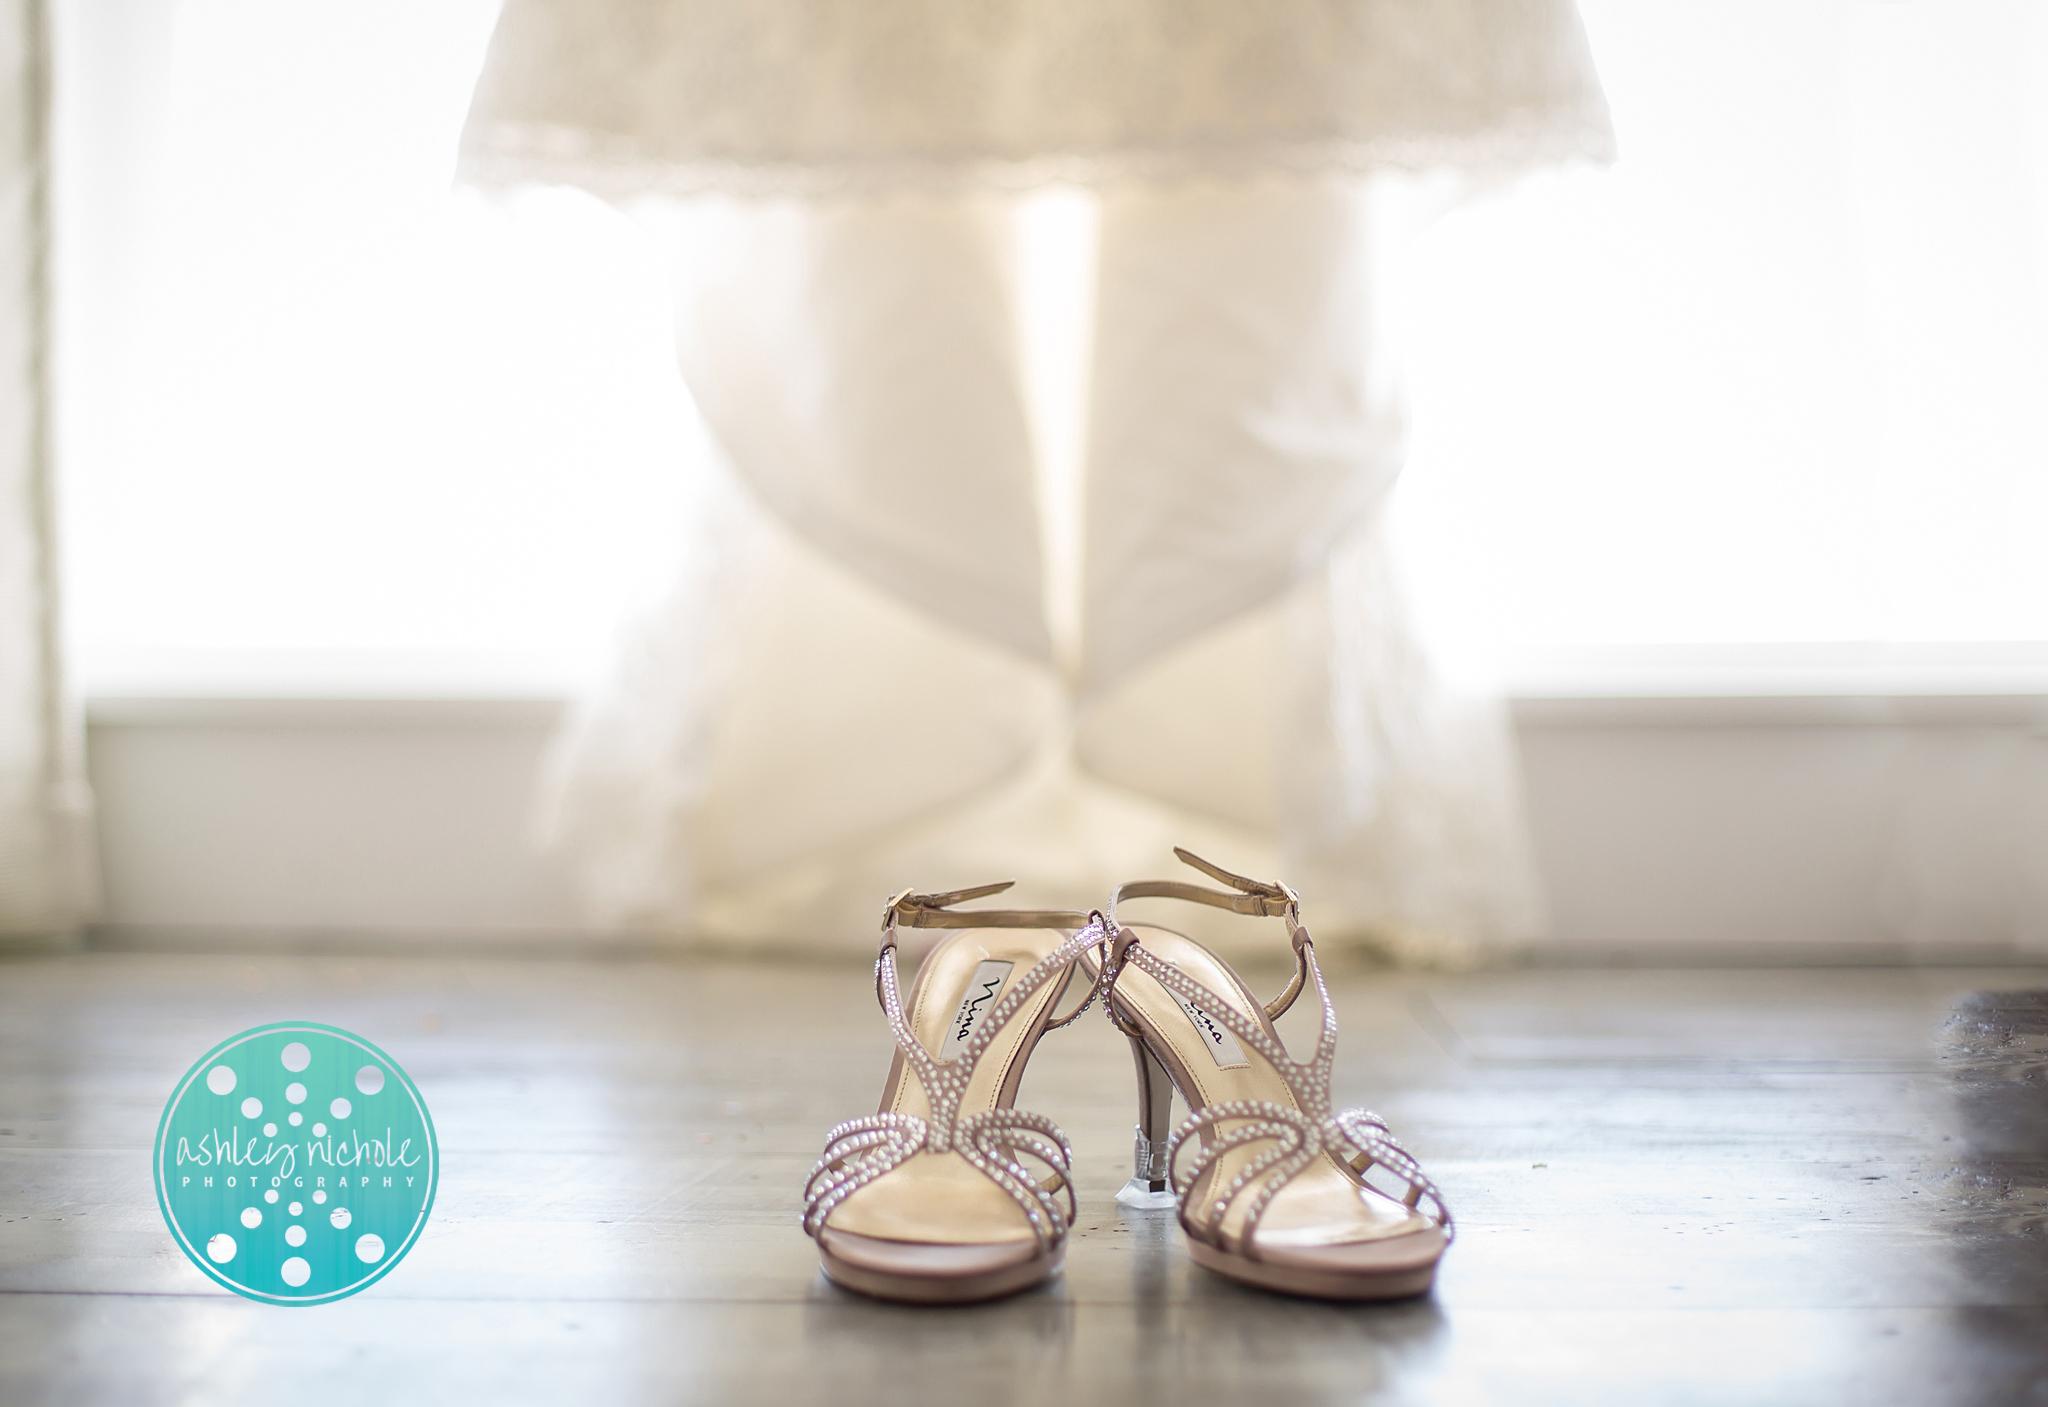 Ashley Nichole Photography- Weddings-77.jpg